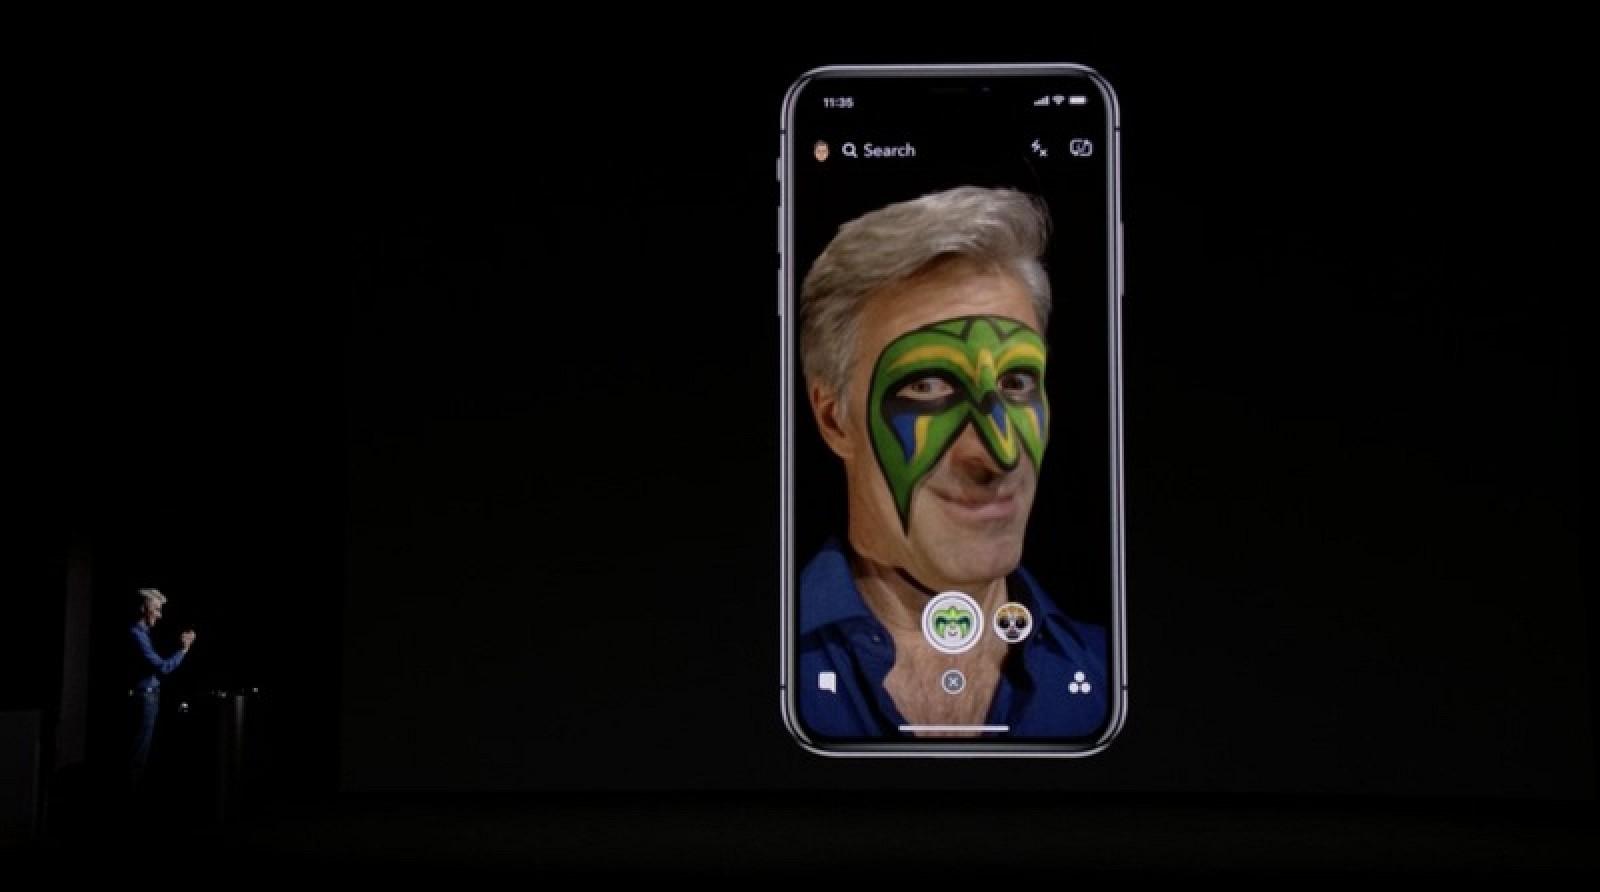 MacRumors - Apple, Mac, iOS News and Rumors